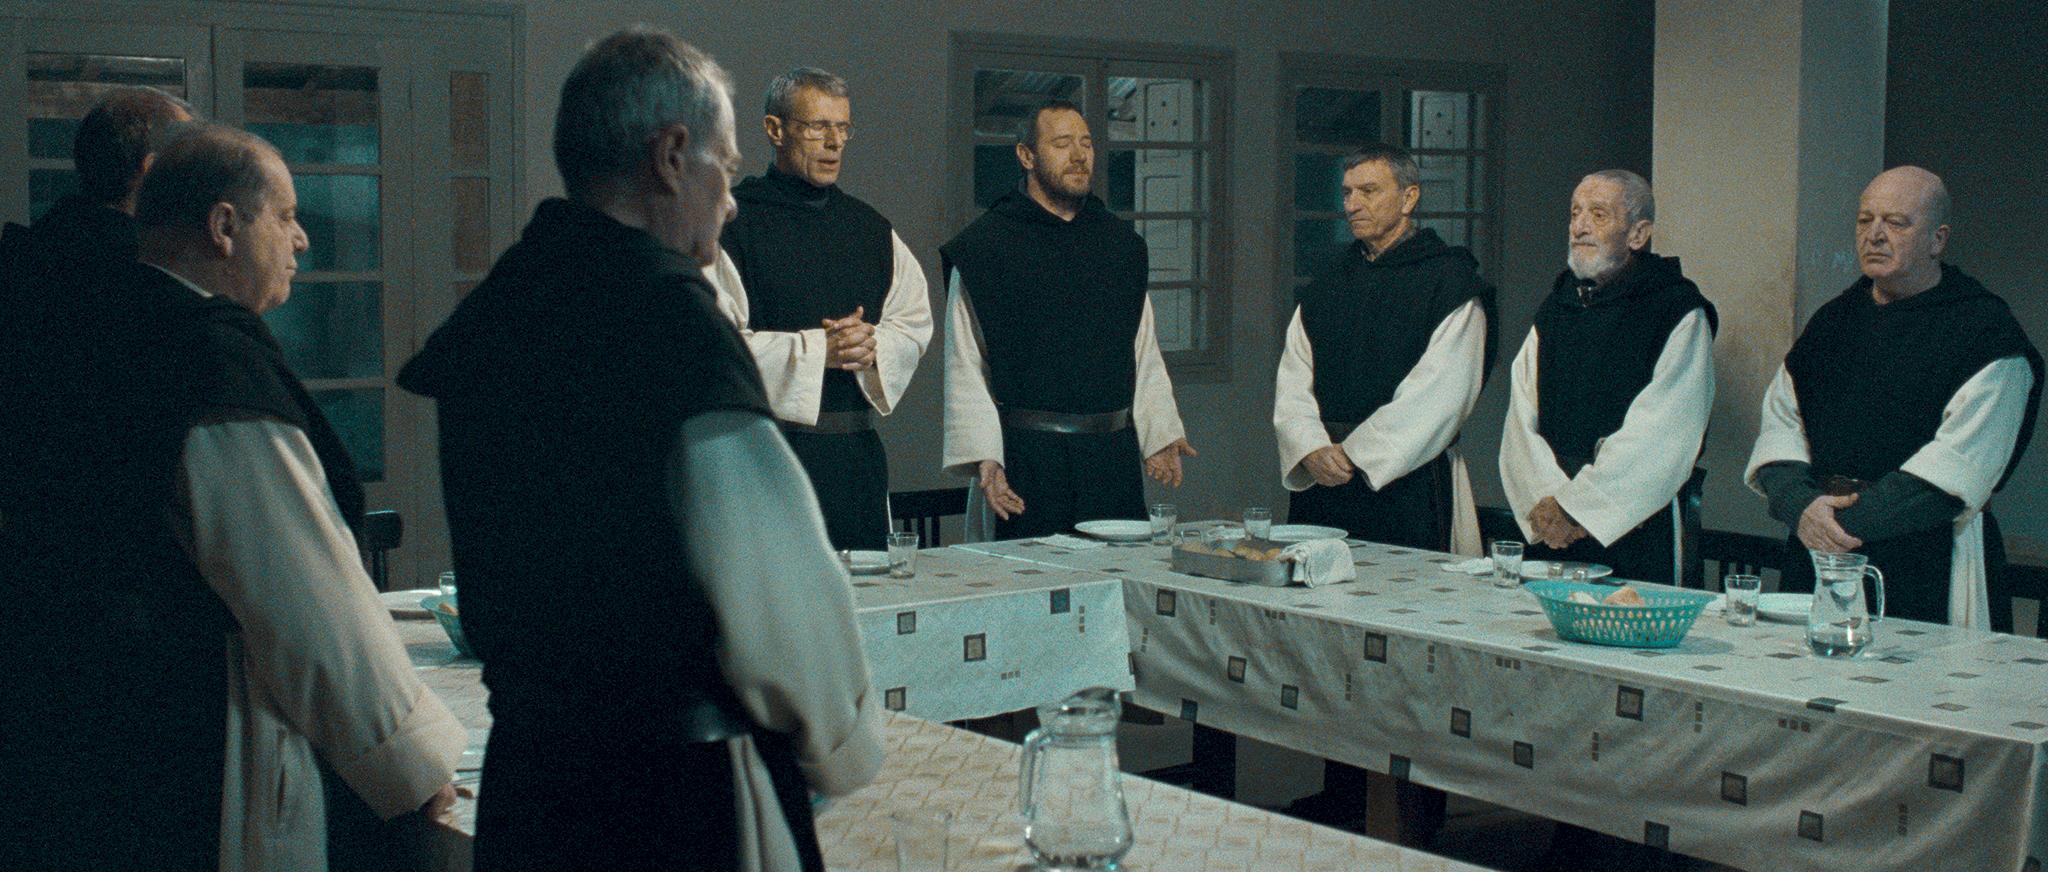 Jacques Herlin, Jean-Marie Frin, Philippe Laudenbach, Olivier Perrier, Loïc Pichon, Olivier Rabourdin, and Lambert Wilson in Des hommes et des dieux (2010)